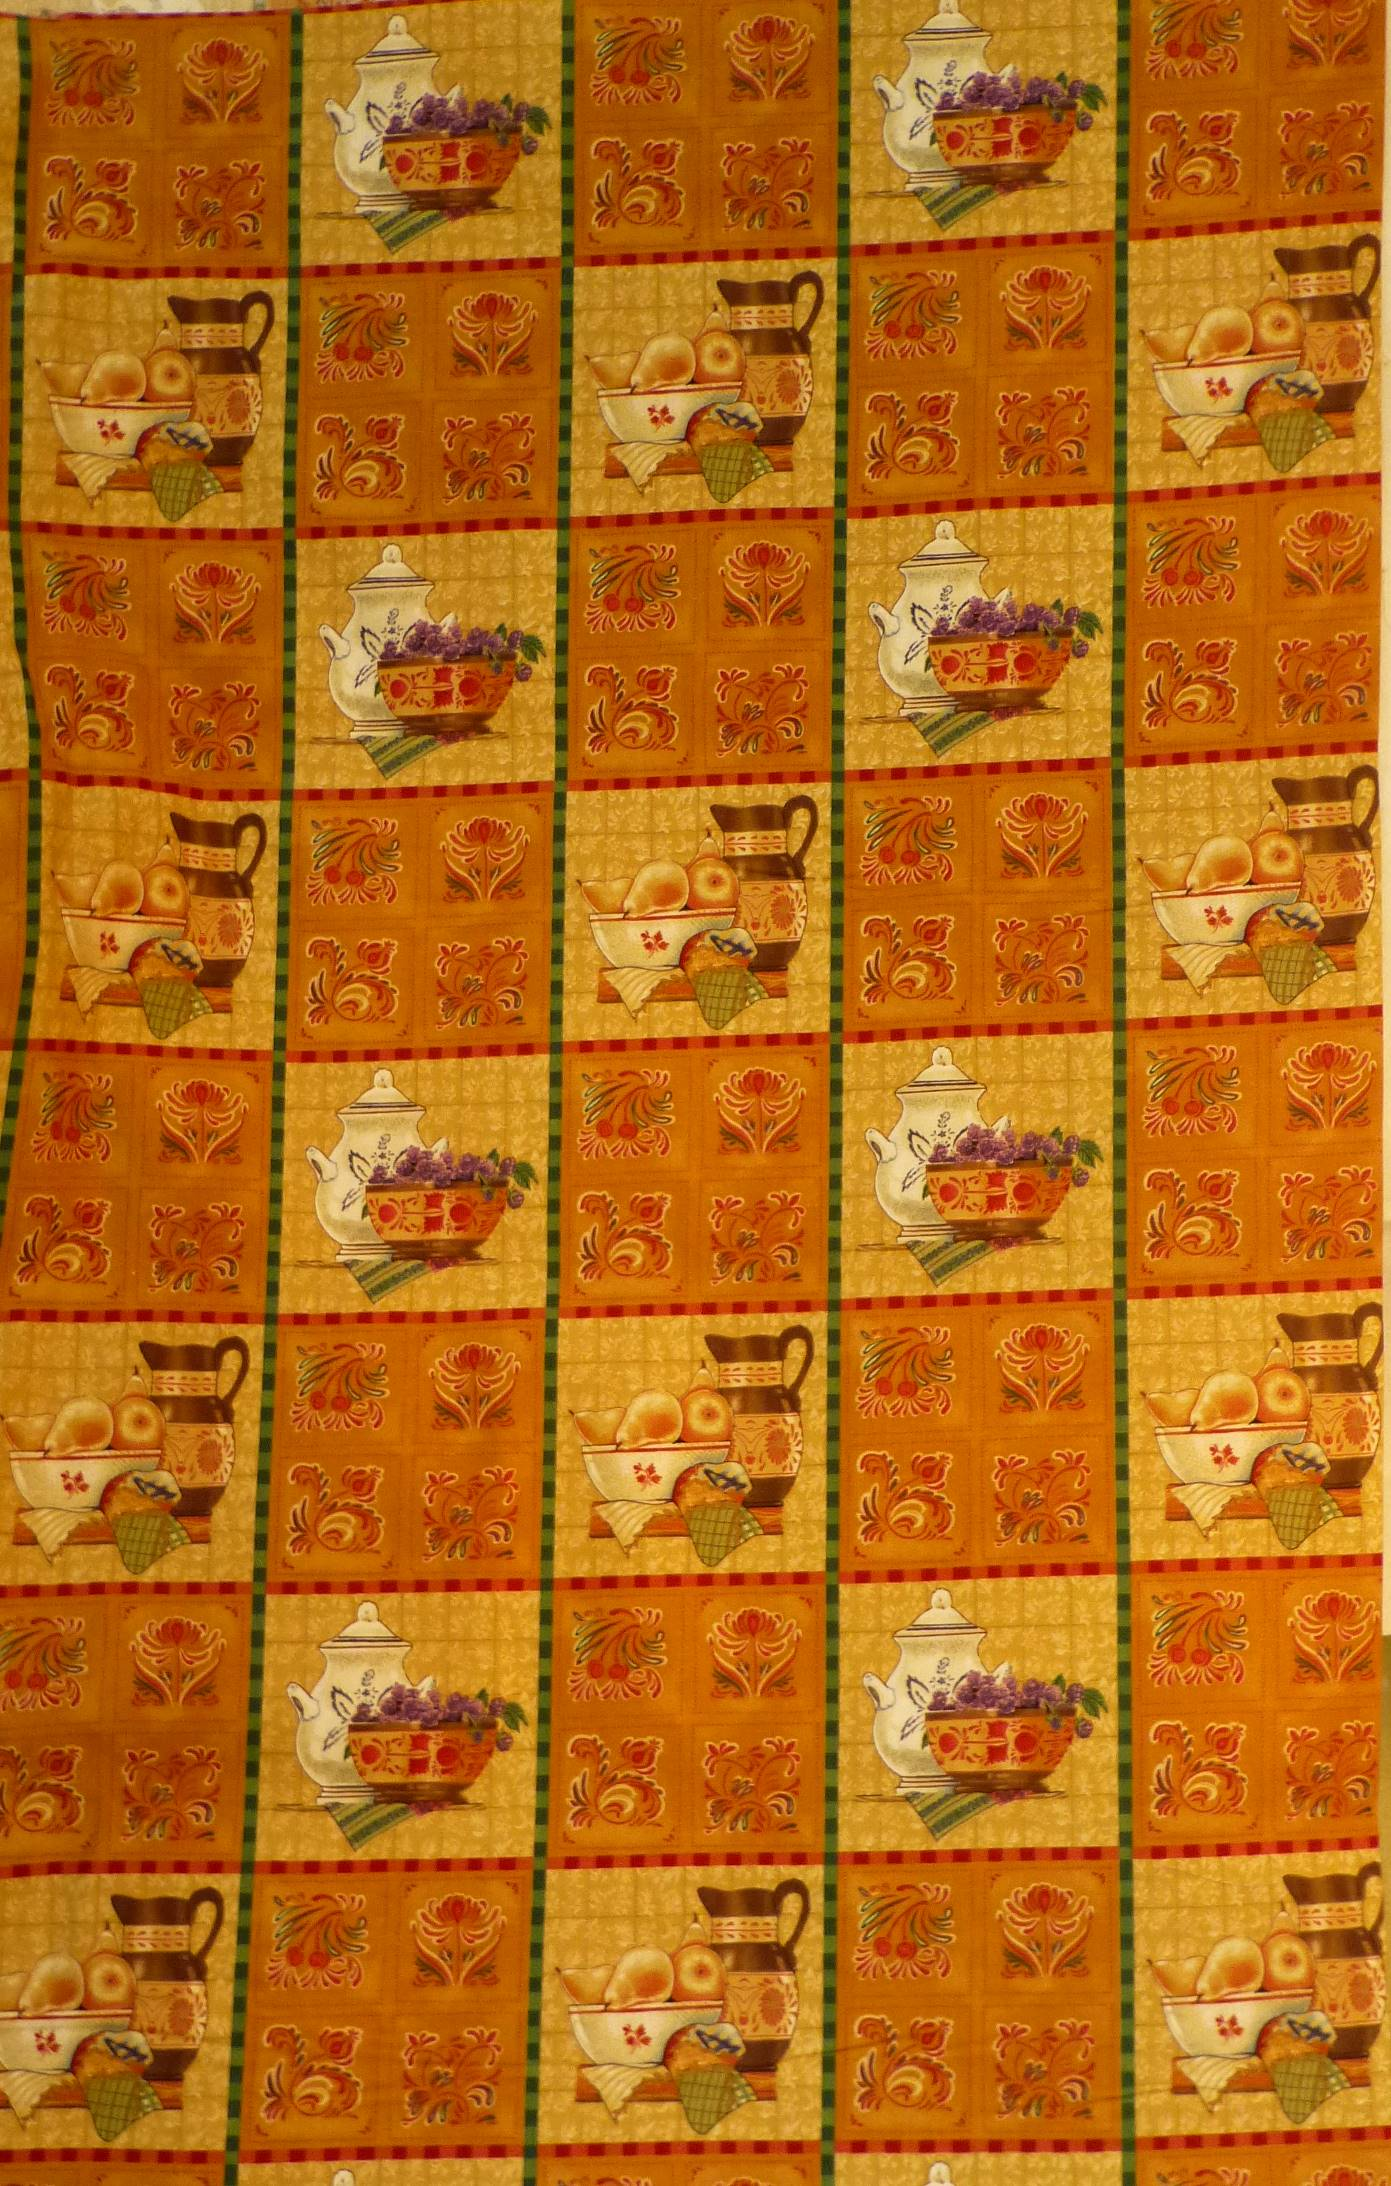 0929-tissu-cranstonvillage-amy-rosenberg